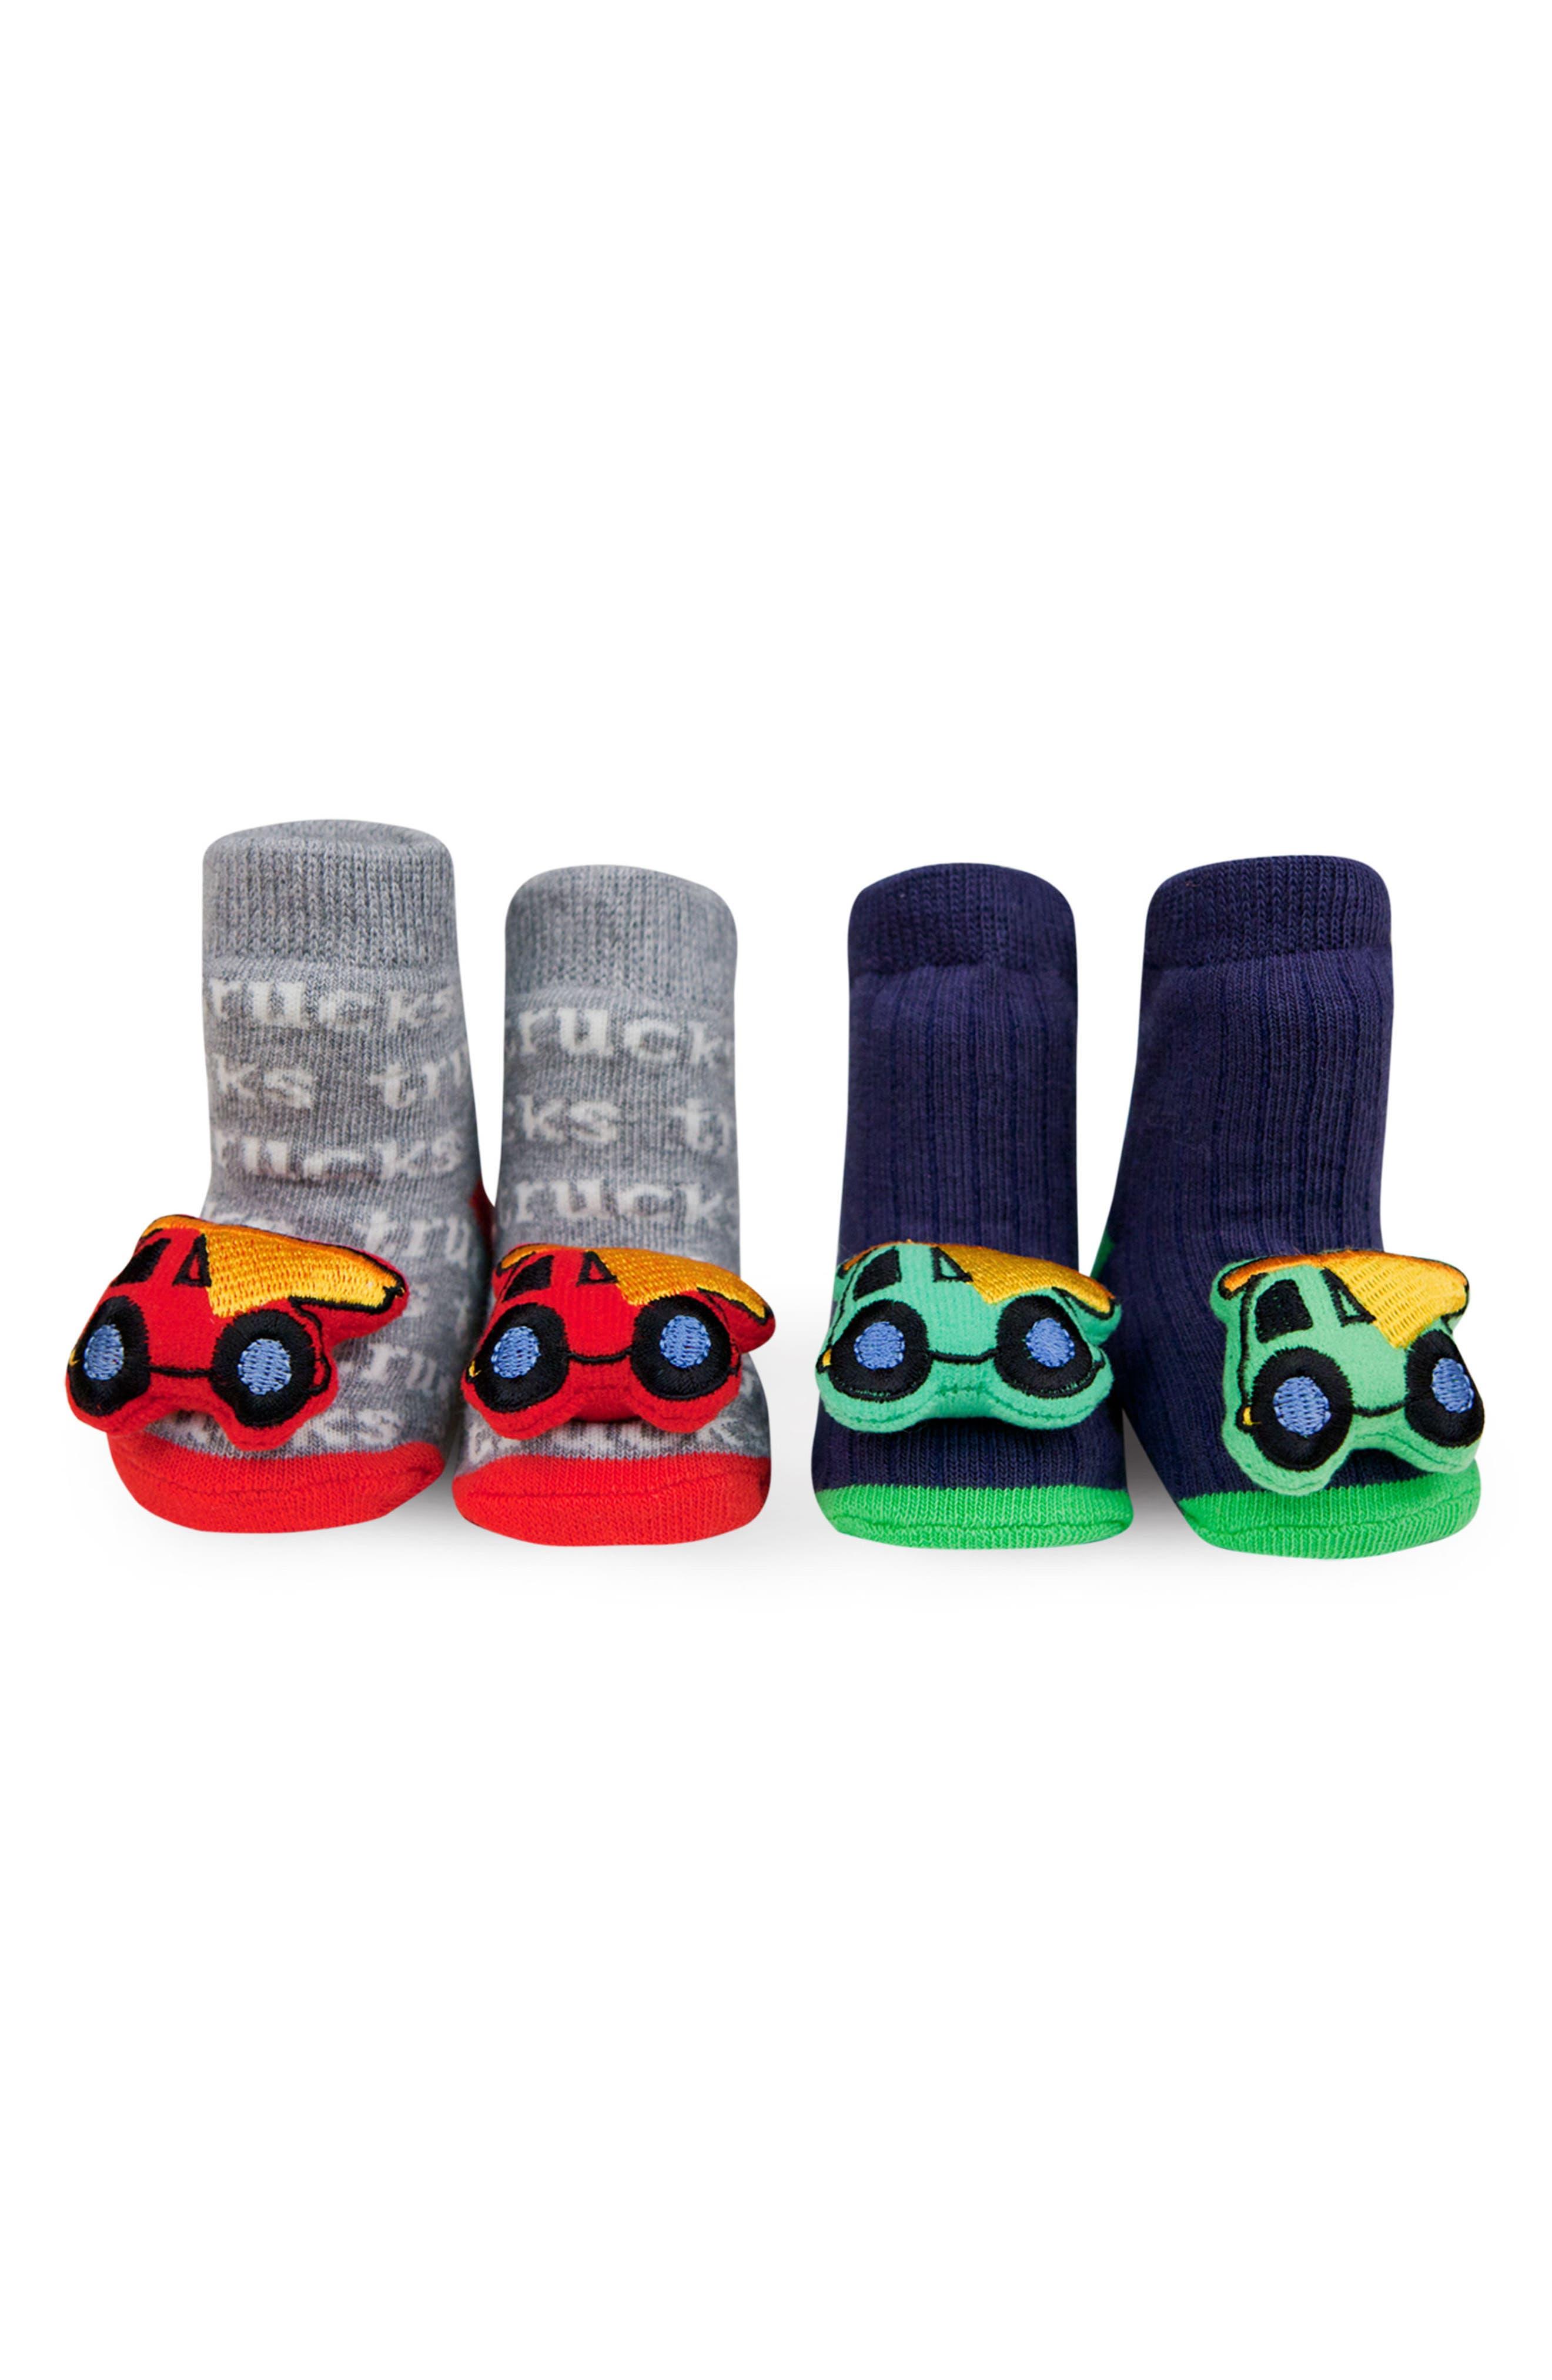 & Friends 2-Pack Vehicle Rattle Socks,                         Main,                         color, 601